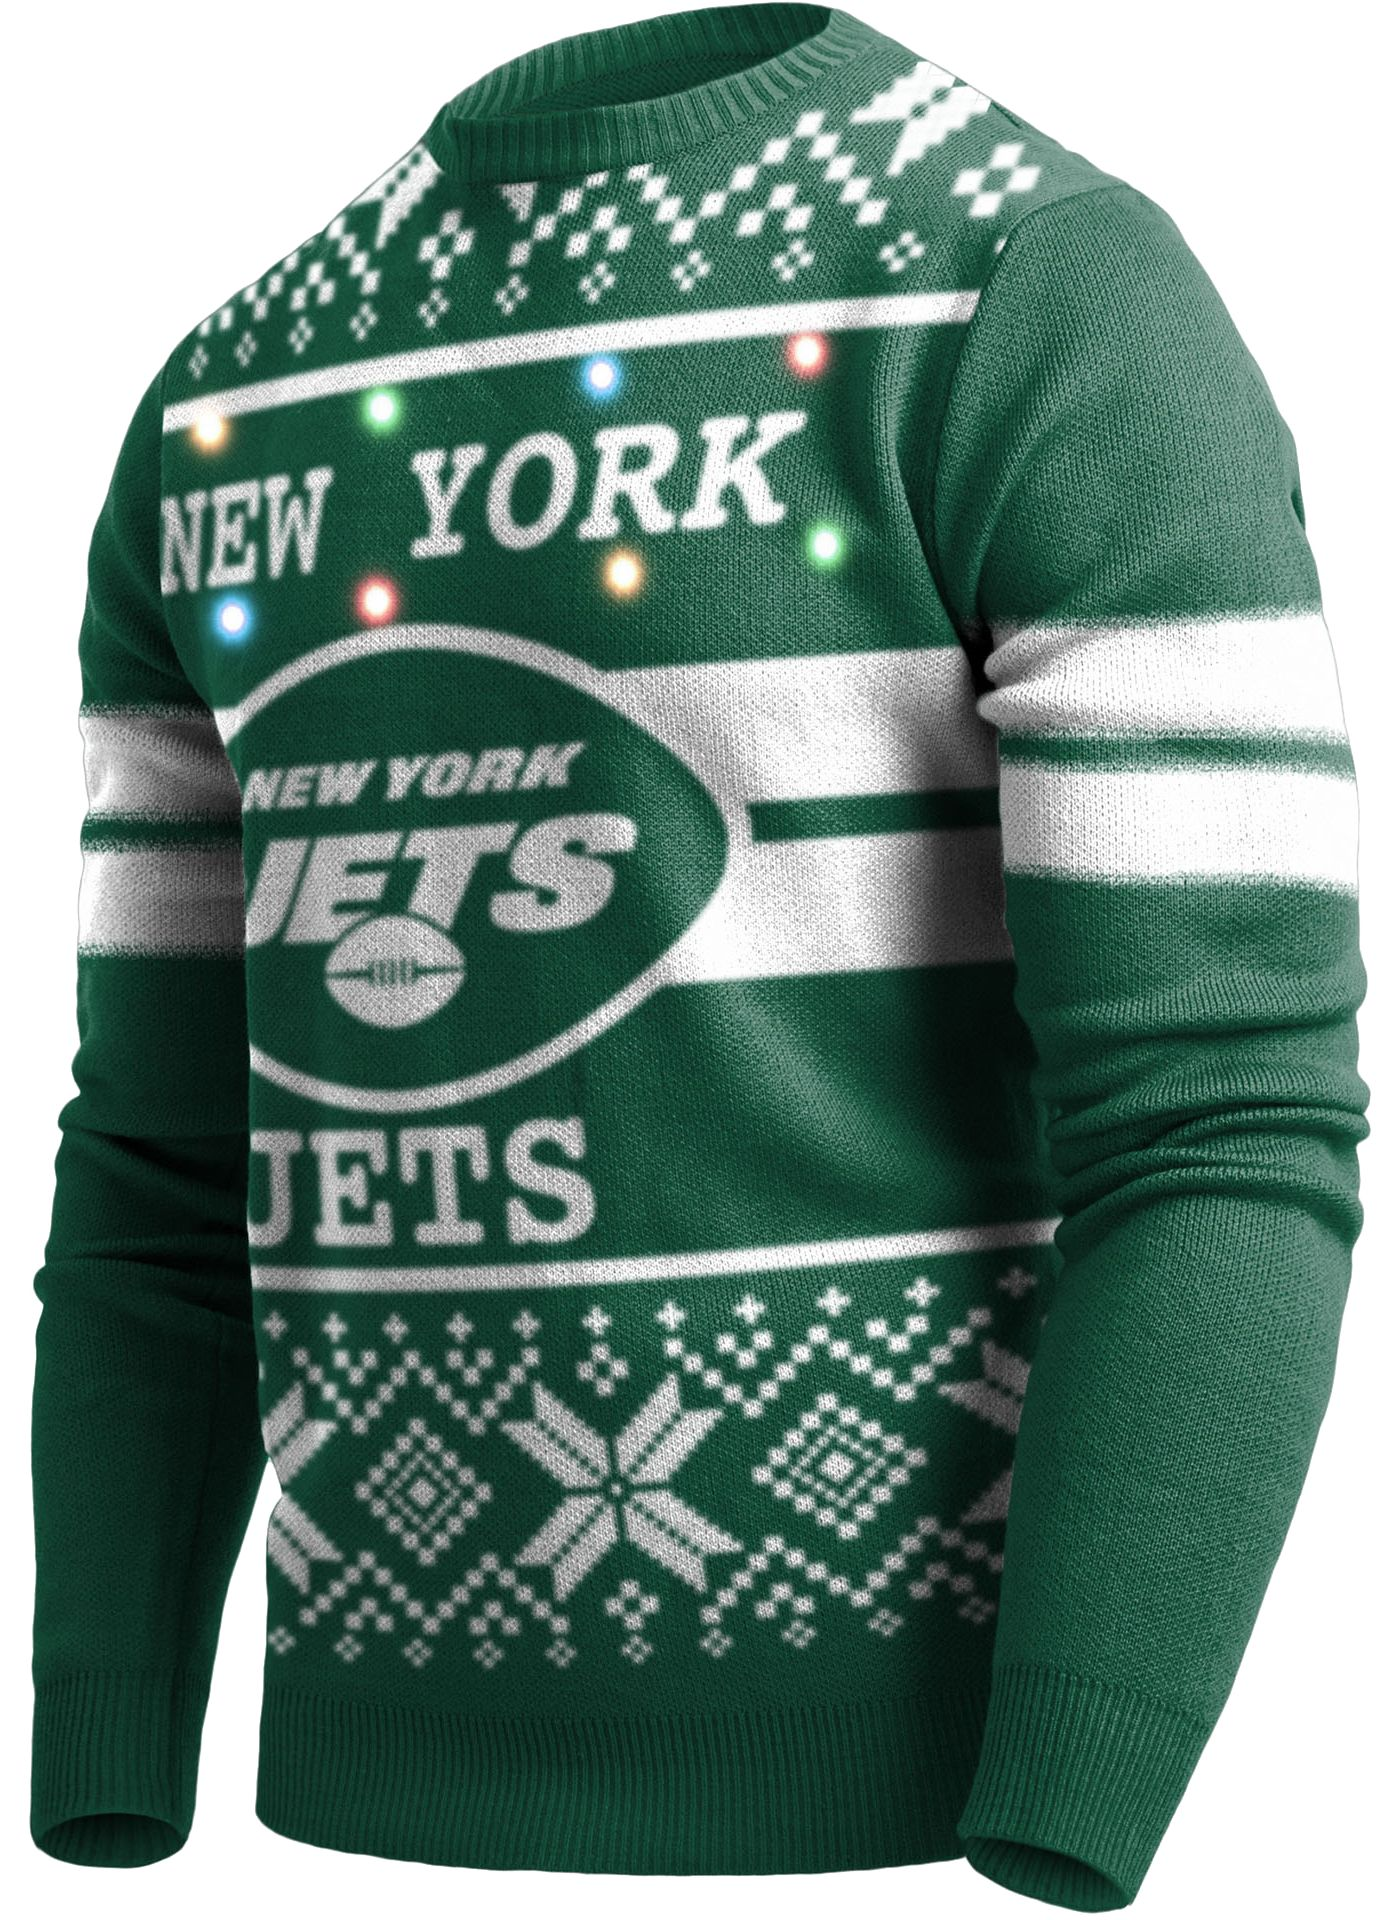 FOCO Men's New York Jets Logo Stripe Light Up Green Ugly Sweater